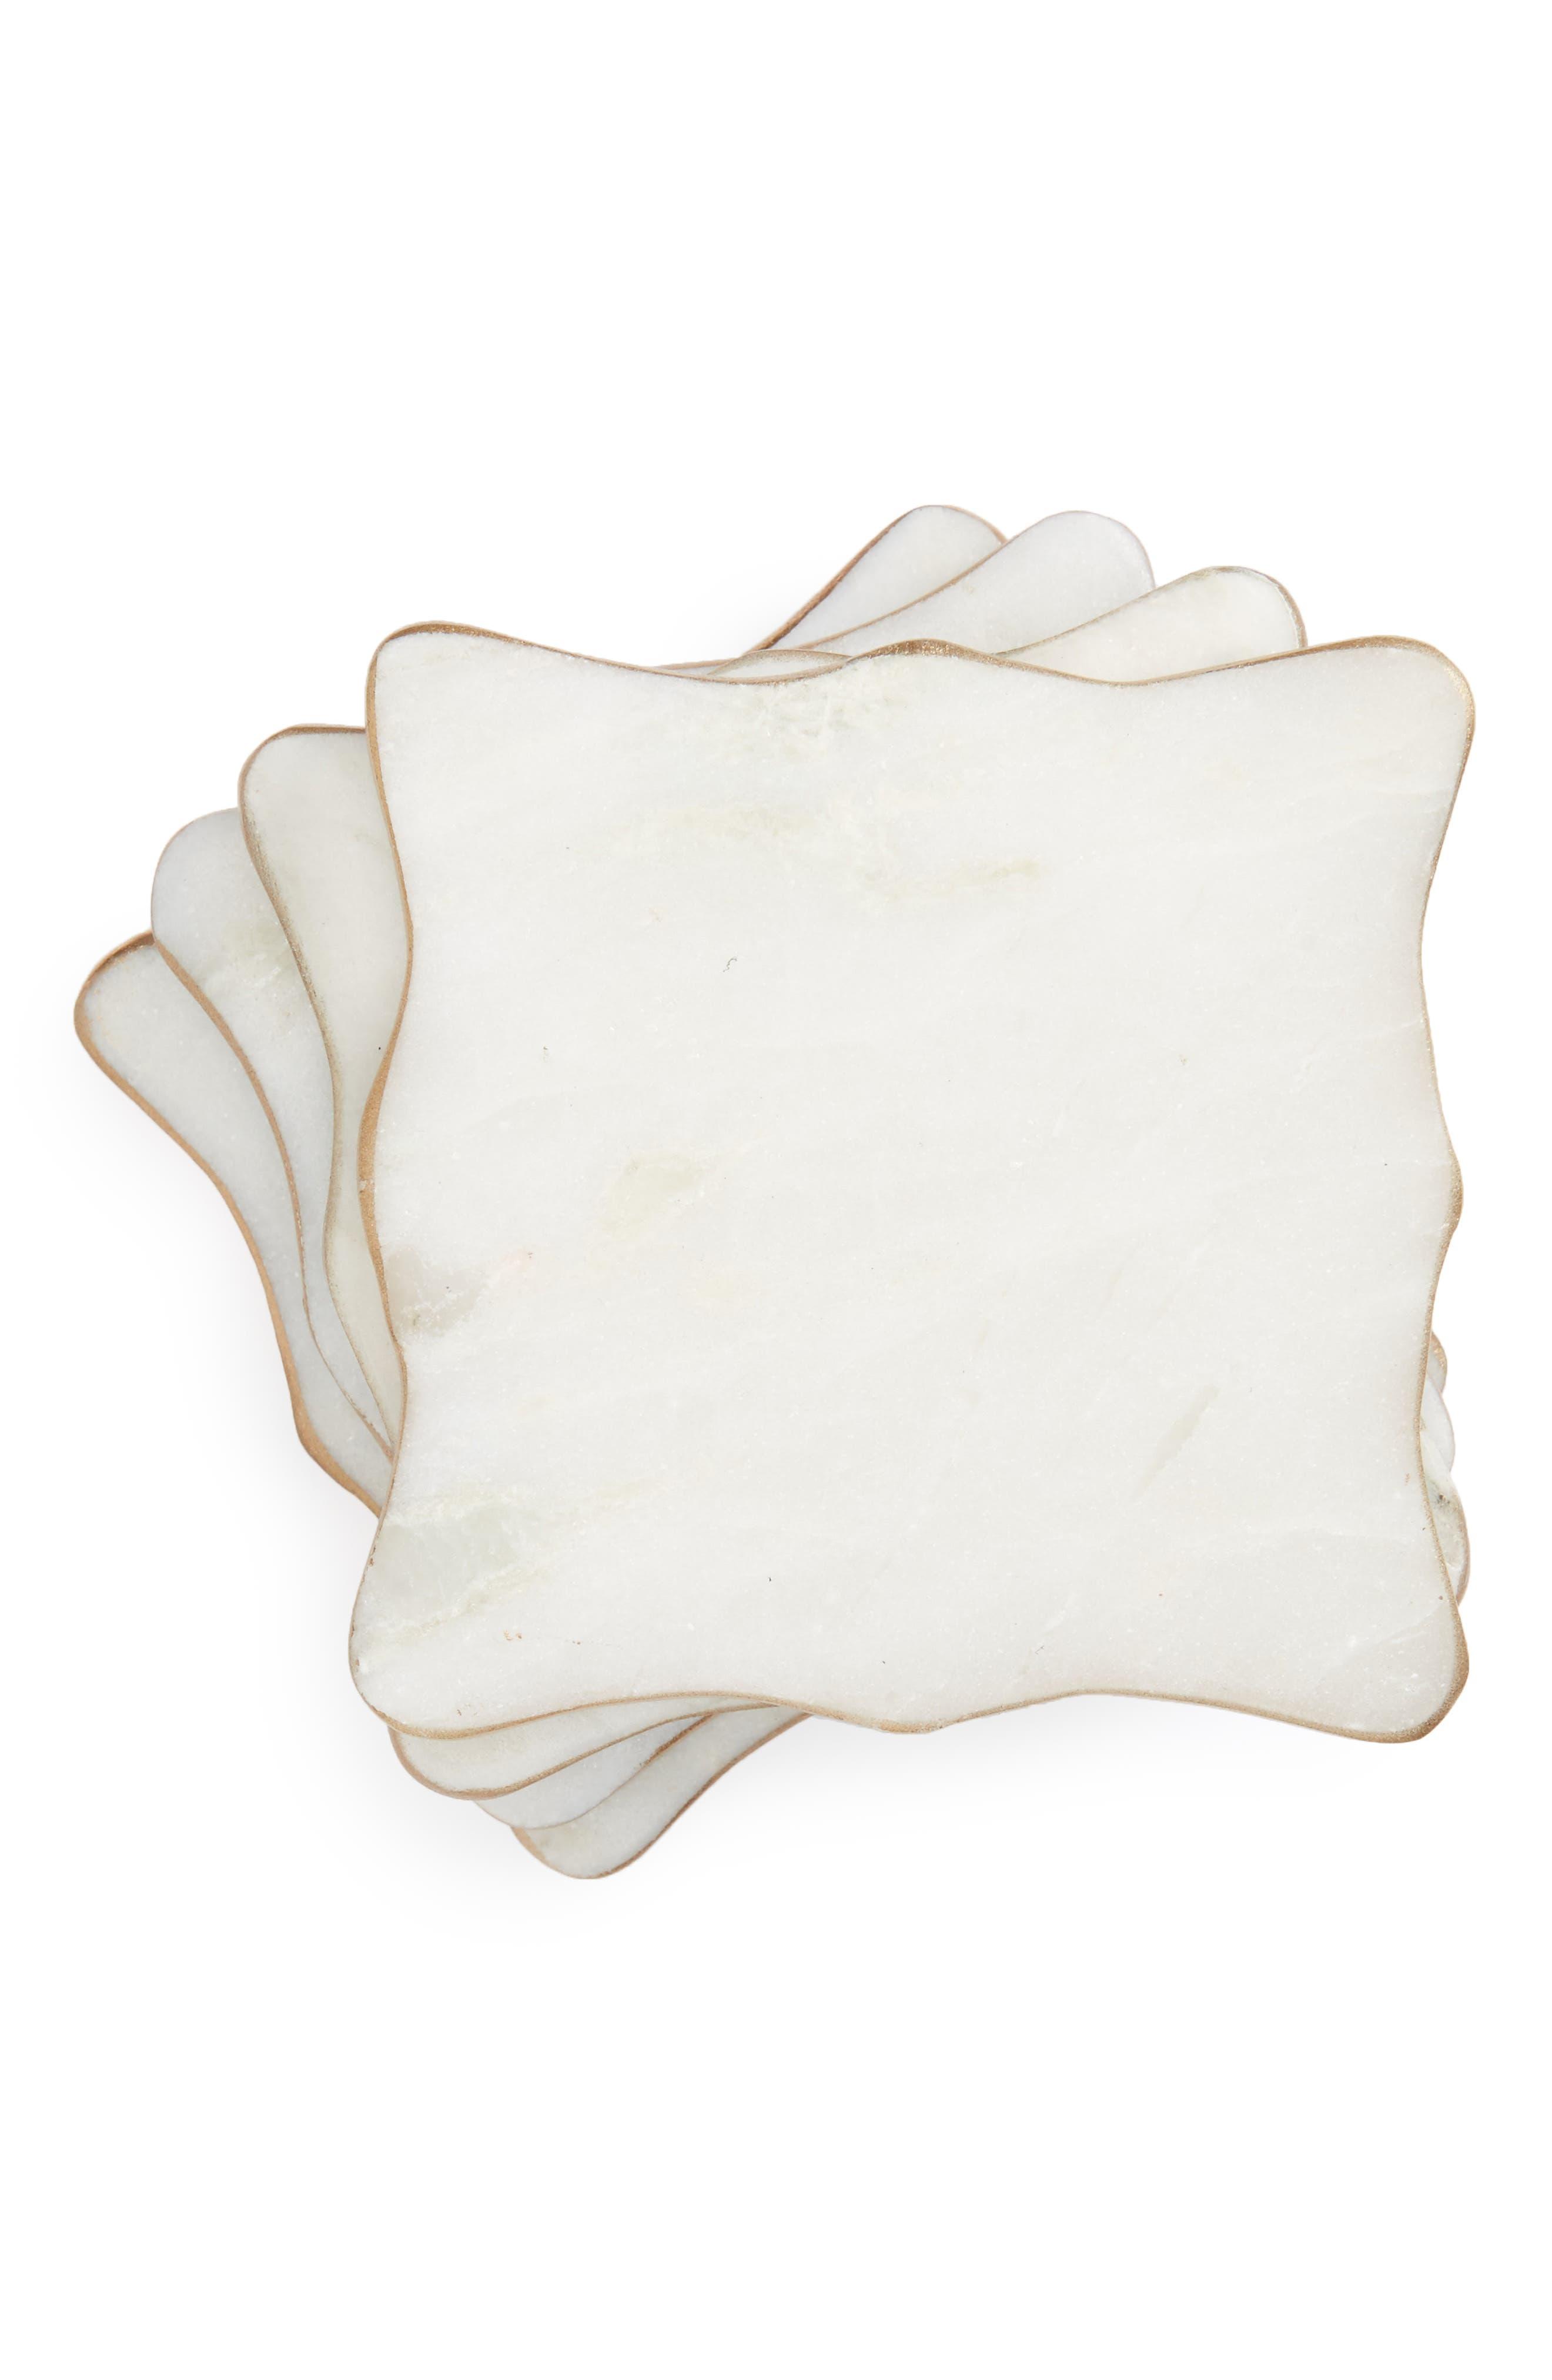 Set of 4 Marble Coasters,                         Main,                         color, White Multi